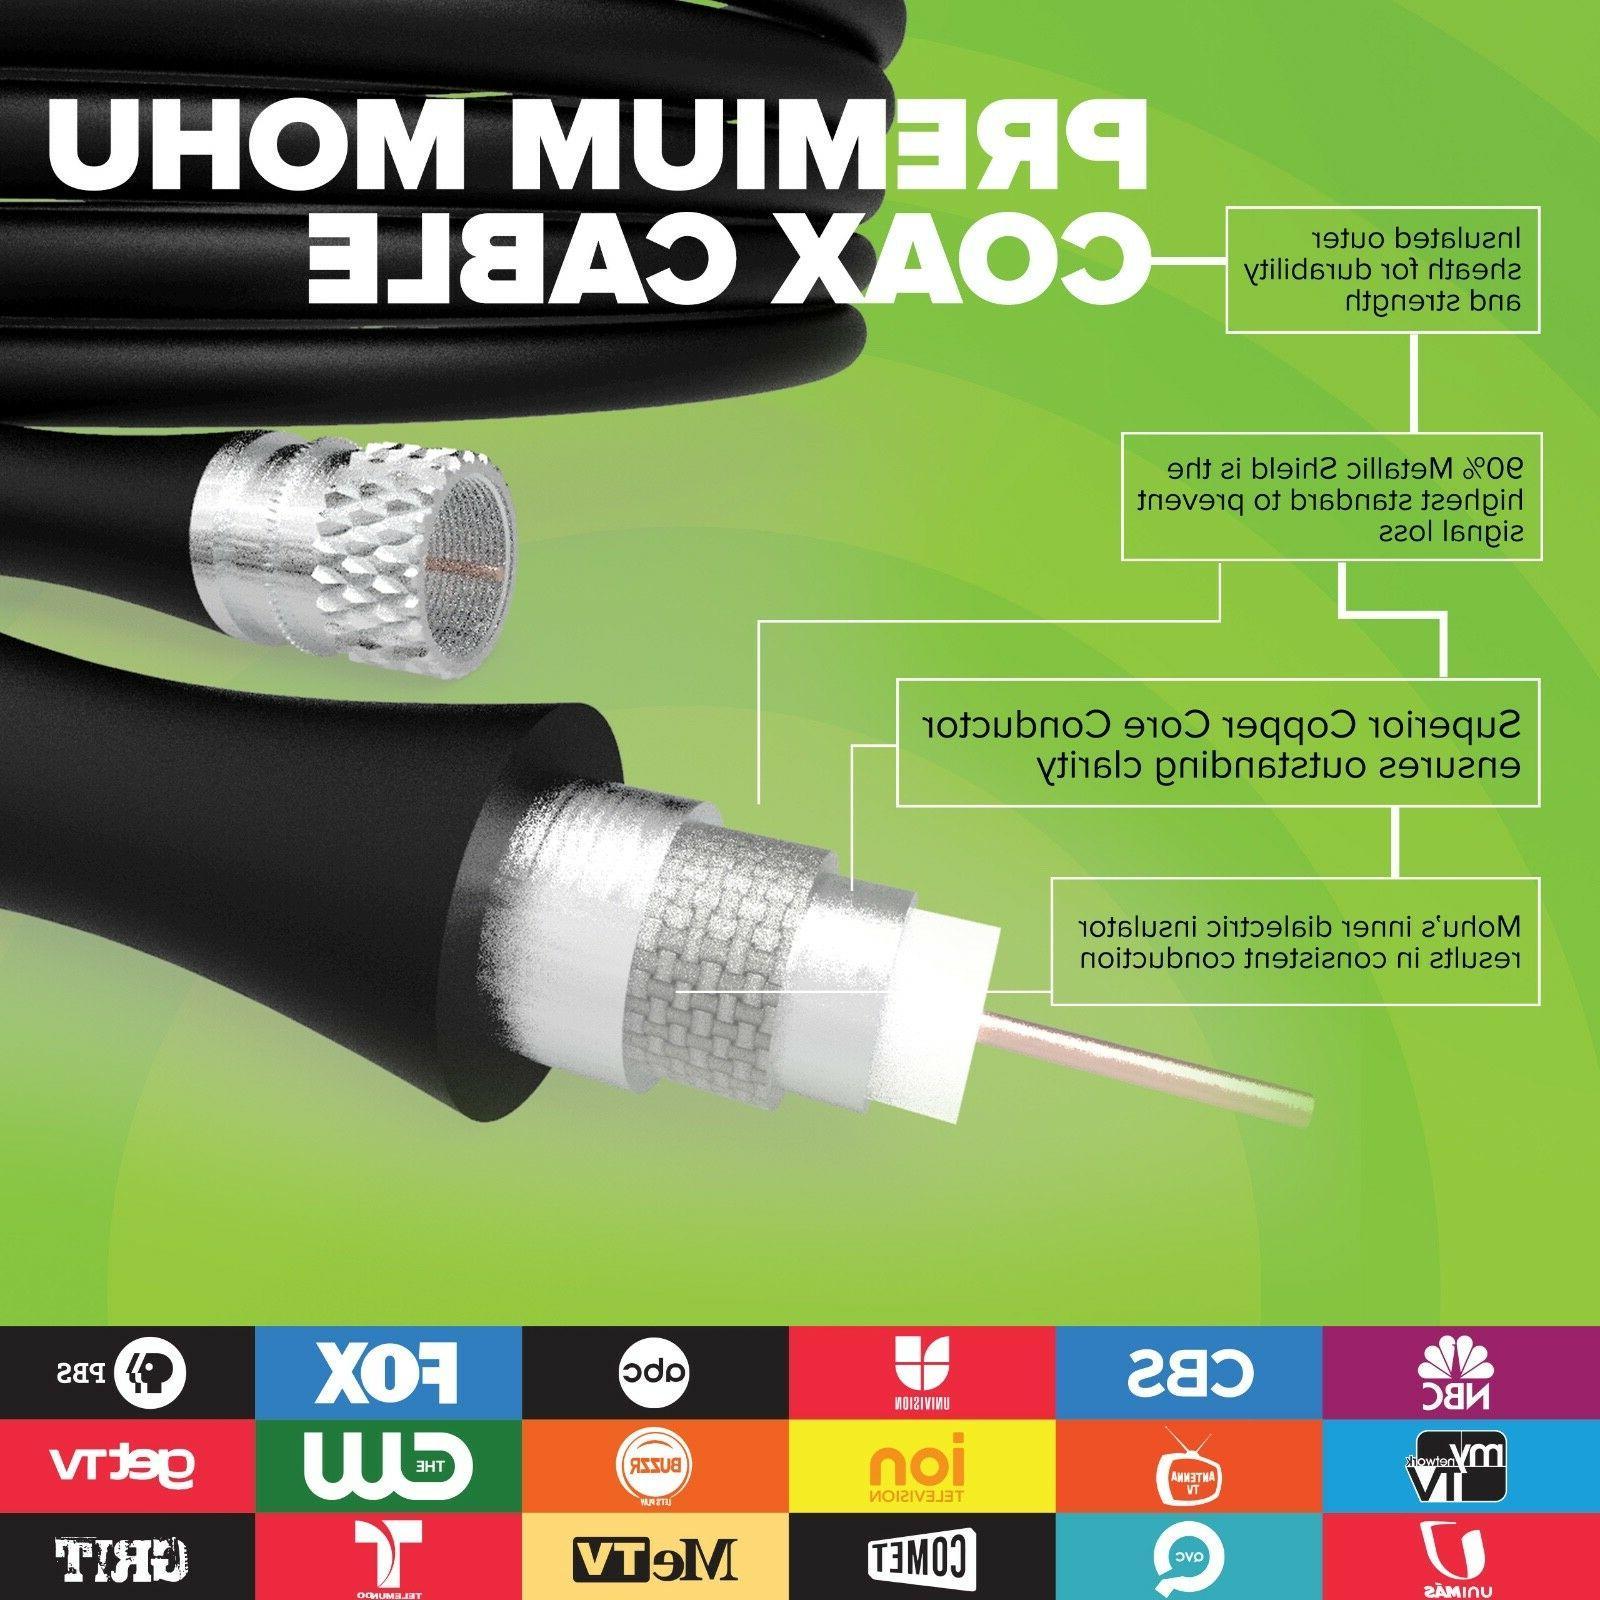 Mohu Premium HDTV 60 Mile Antenna - Modern Soundbar Style